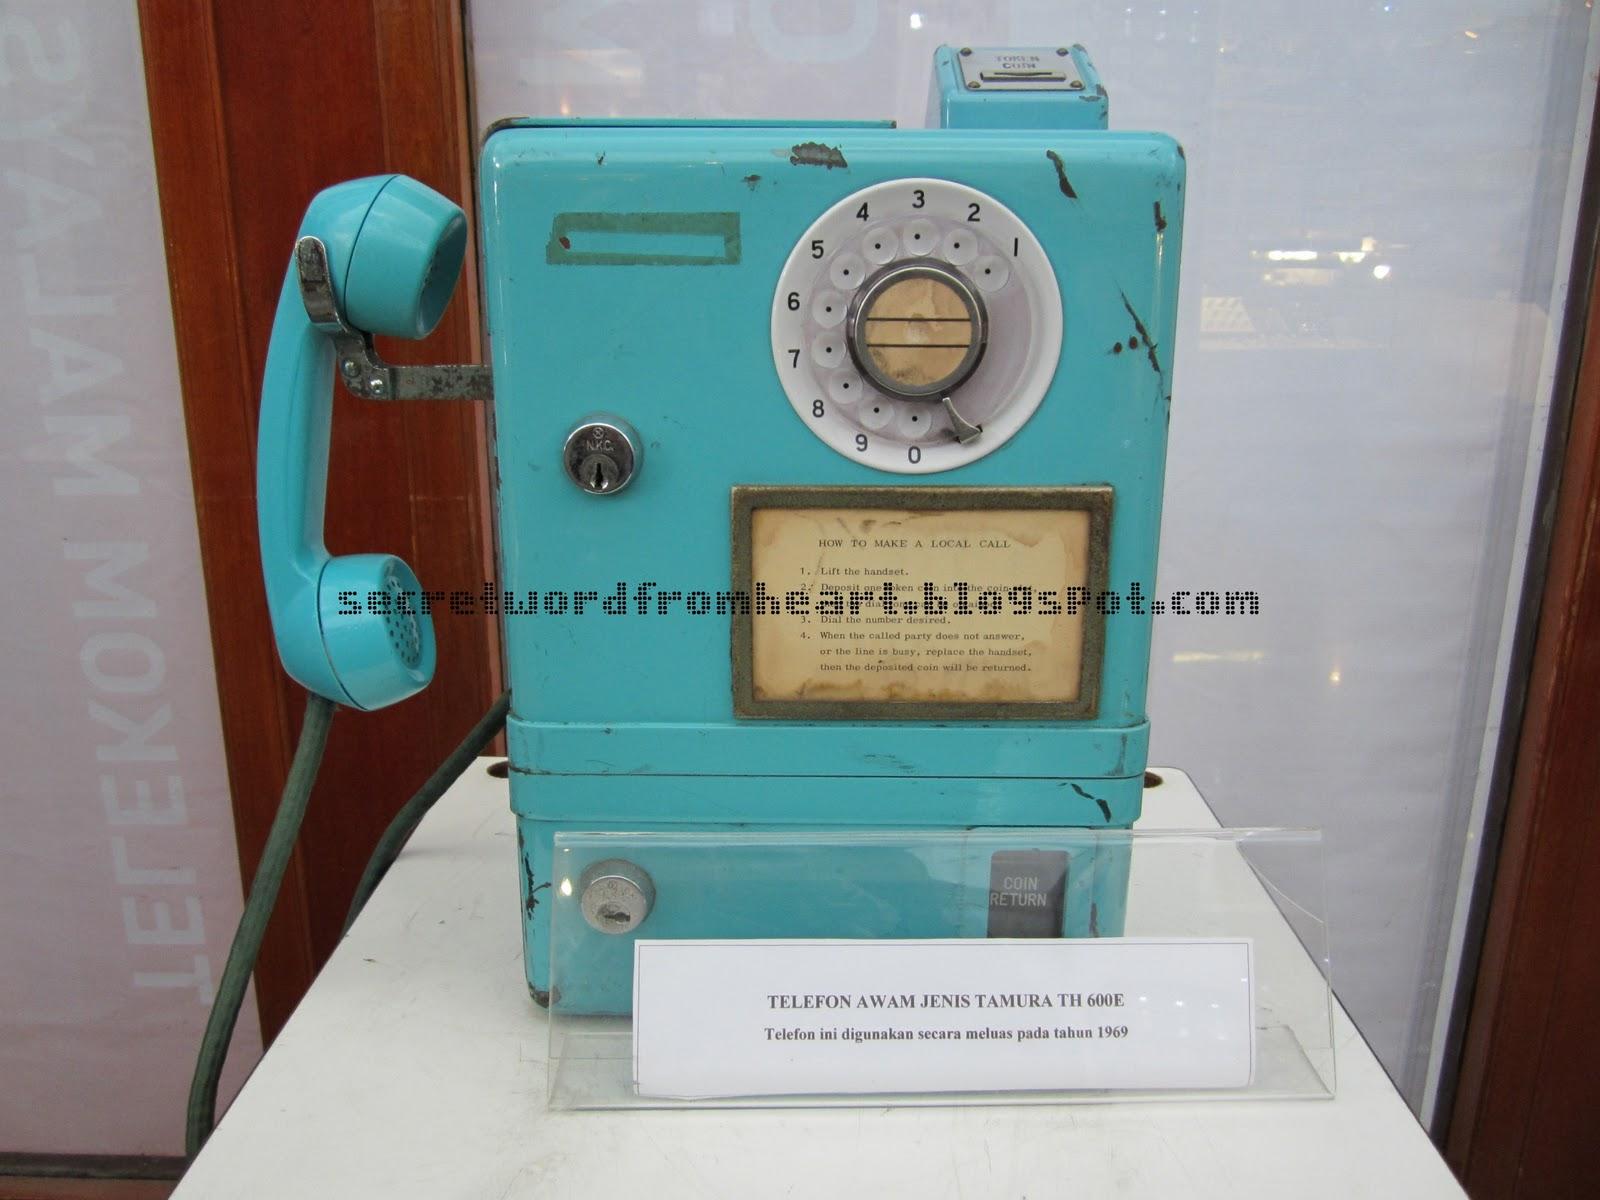 MENARA KUALA LUMPUR - TELEFON BERBUNYI  RING  RING  RING